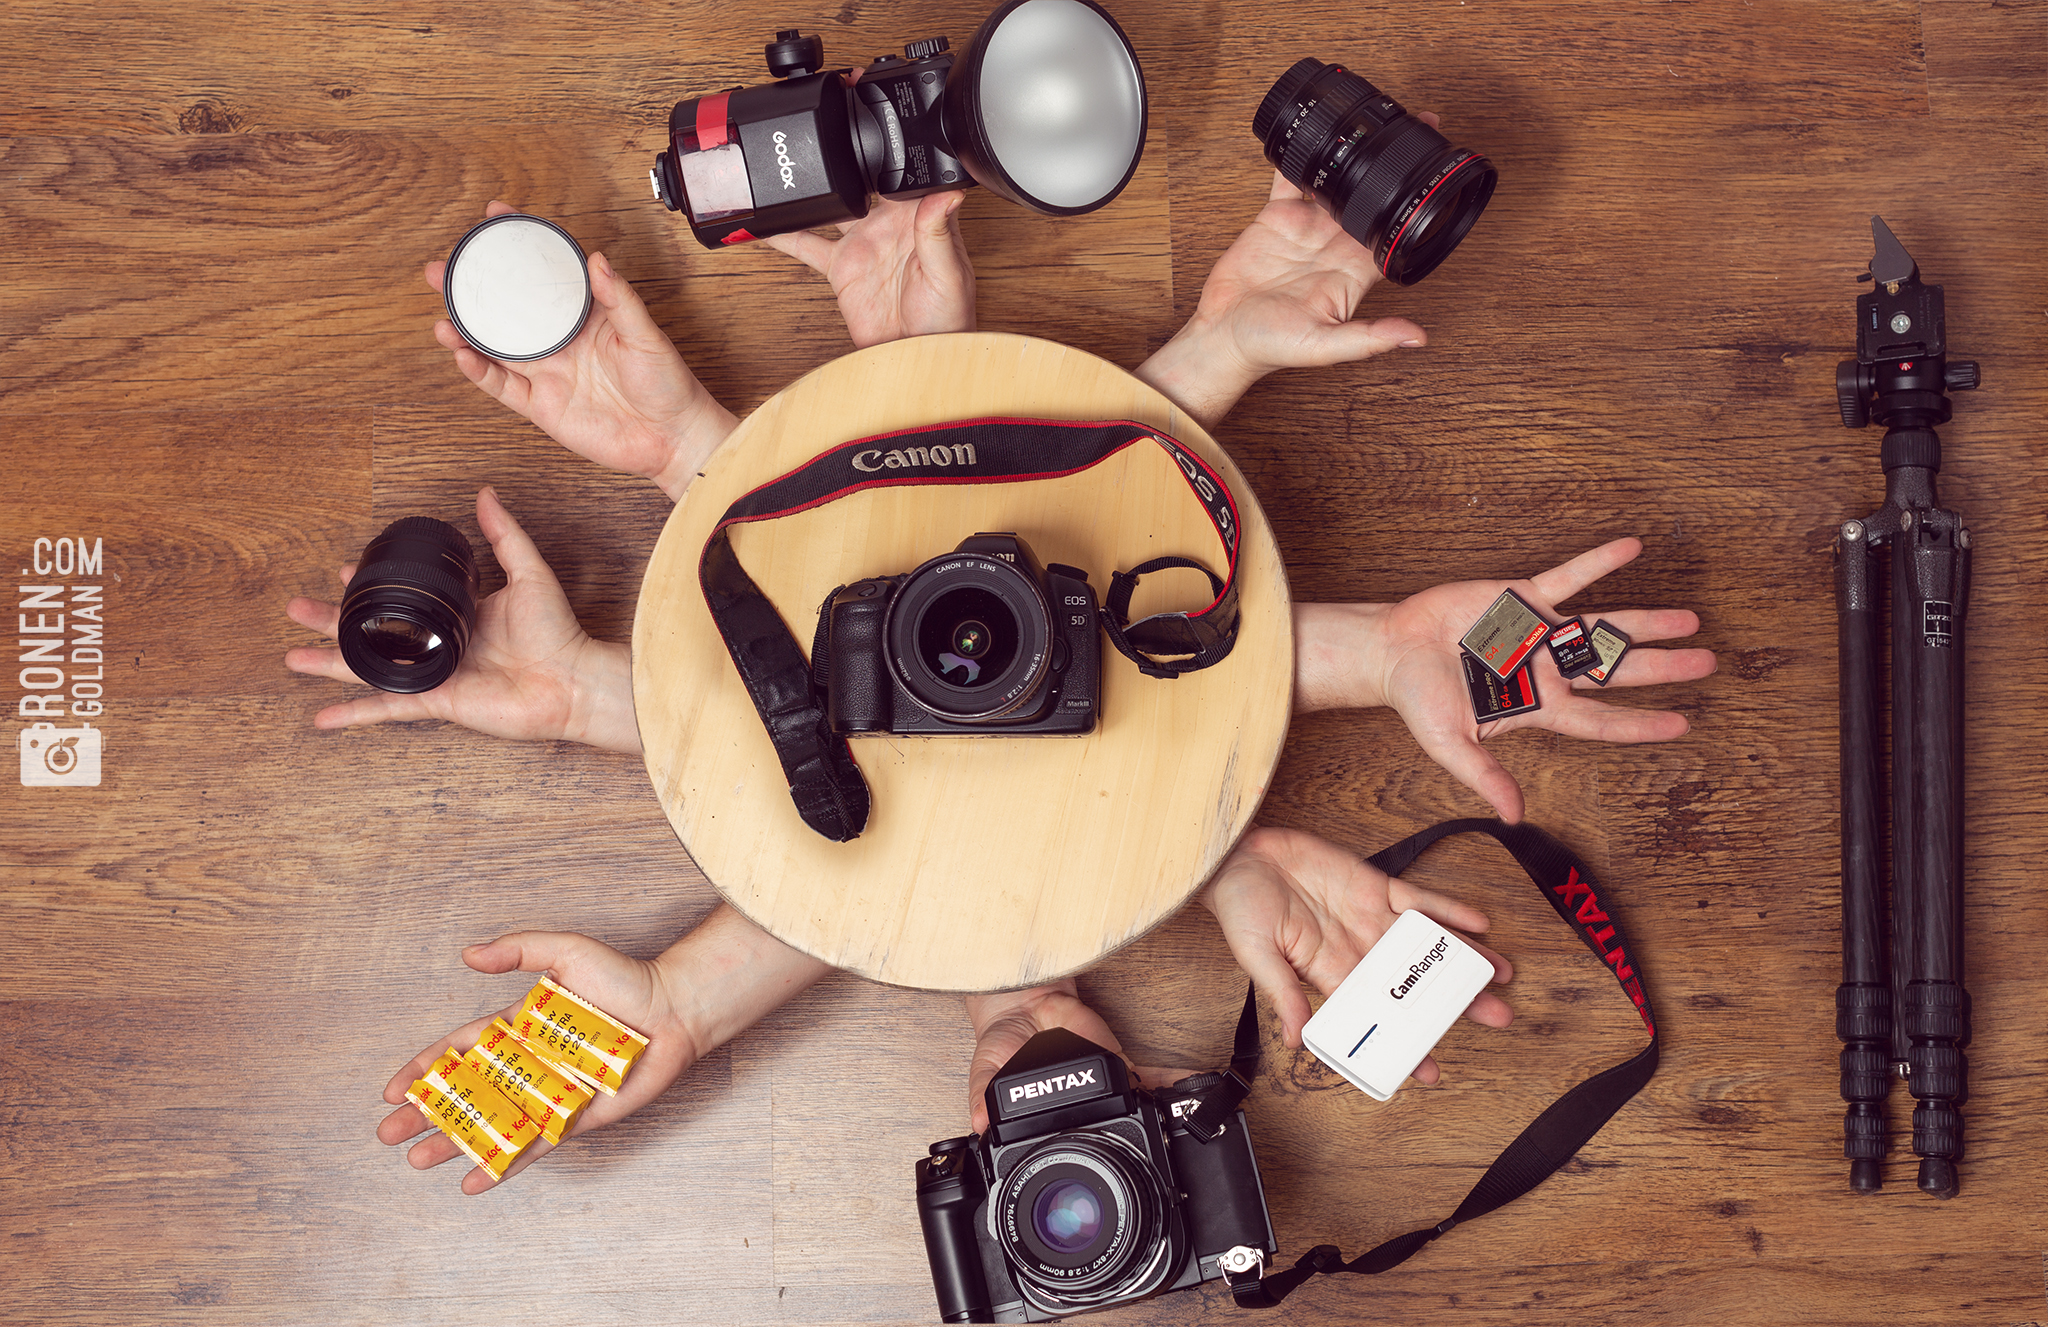 My Gear:      Cameras:   Canon 5d mk3  Pentax 67ii   Lenses:   Canon 16-35 2.8  Canon 85 1.8  Canon 100 Macro  Pentax SMC 105 2.4   Lighting:   Godox AD360  Elinchrom Deep Octa Rotalux   Film Stock:   Kodak Portra 400   Misc   Camranger  Variable ND  Gitzo Carbon Fiber Tripod